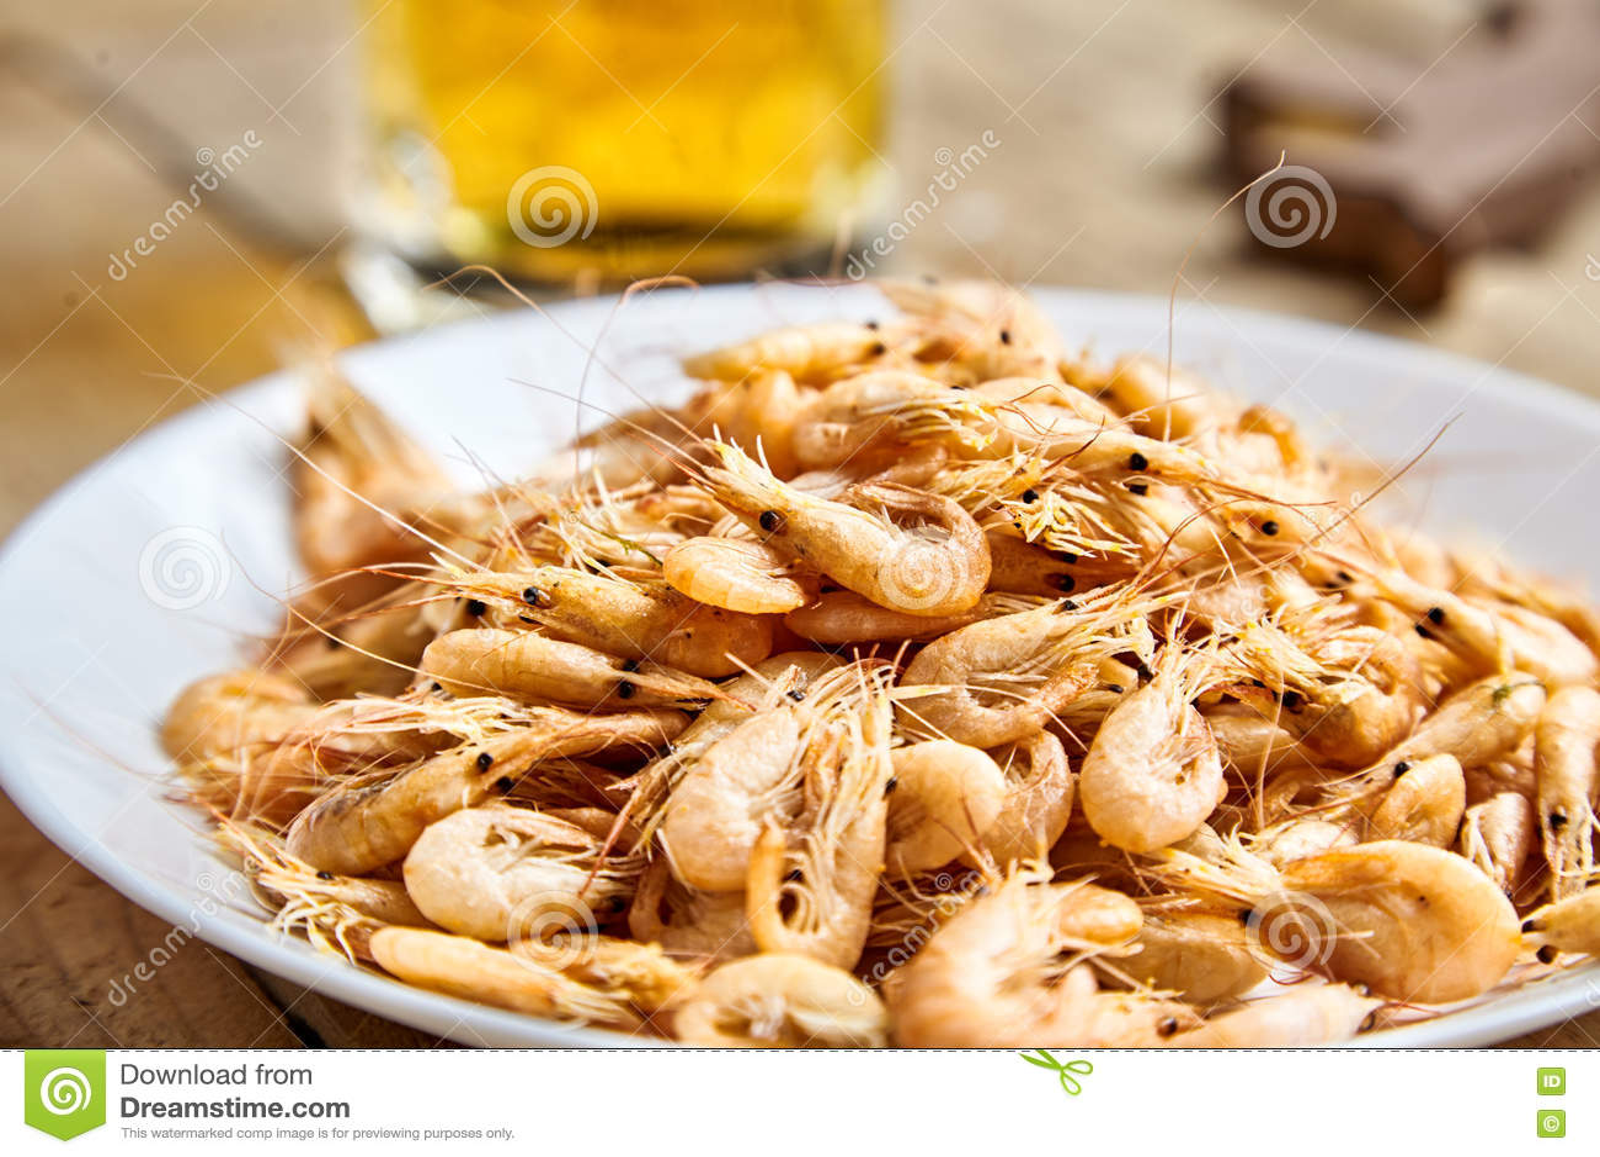 Shrimp boiled - an easy and tasty snack